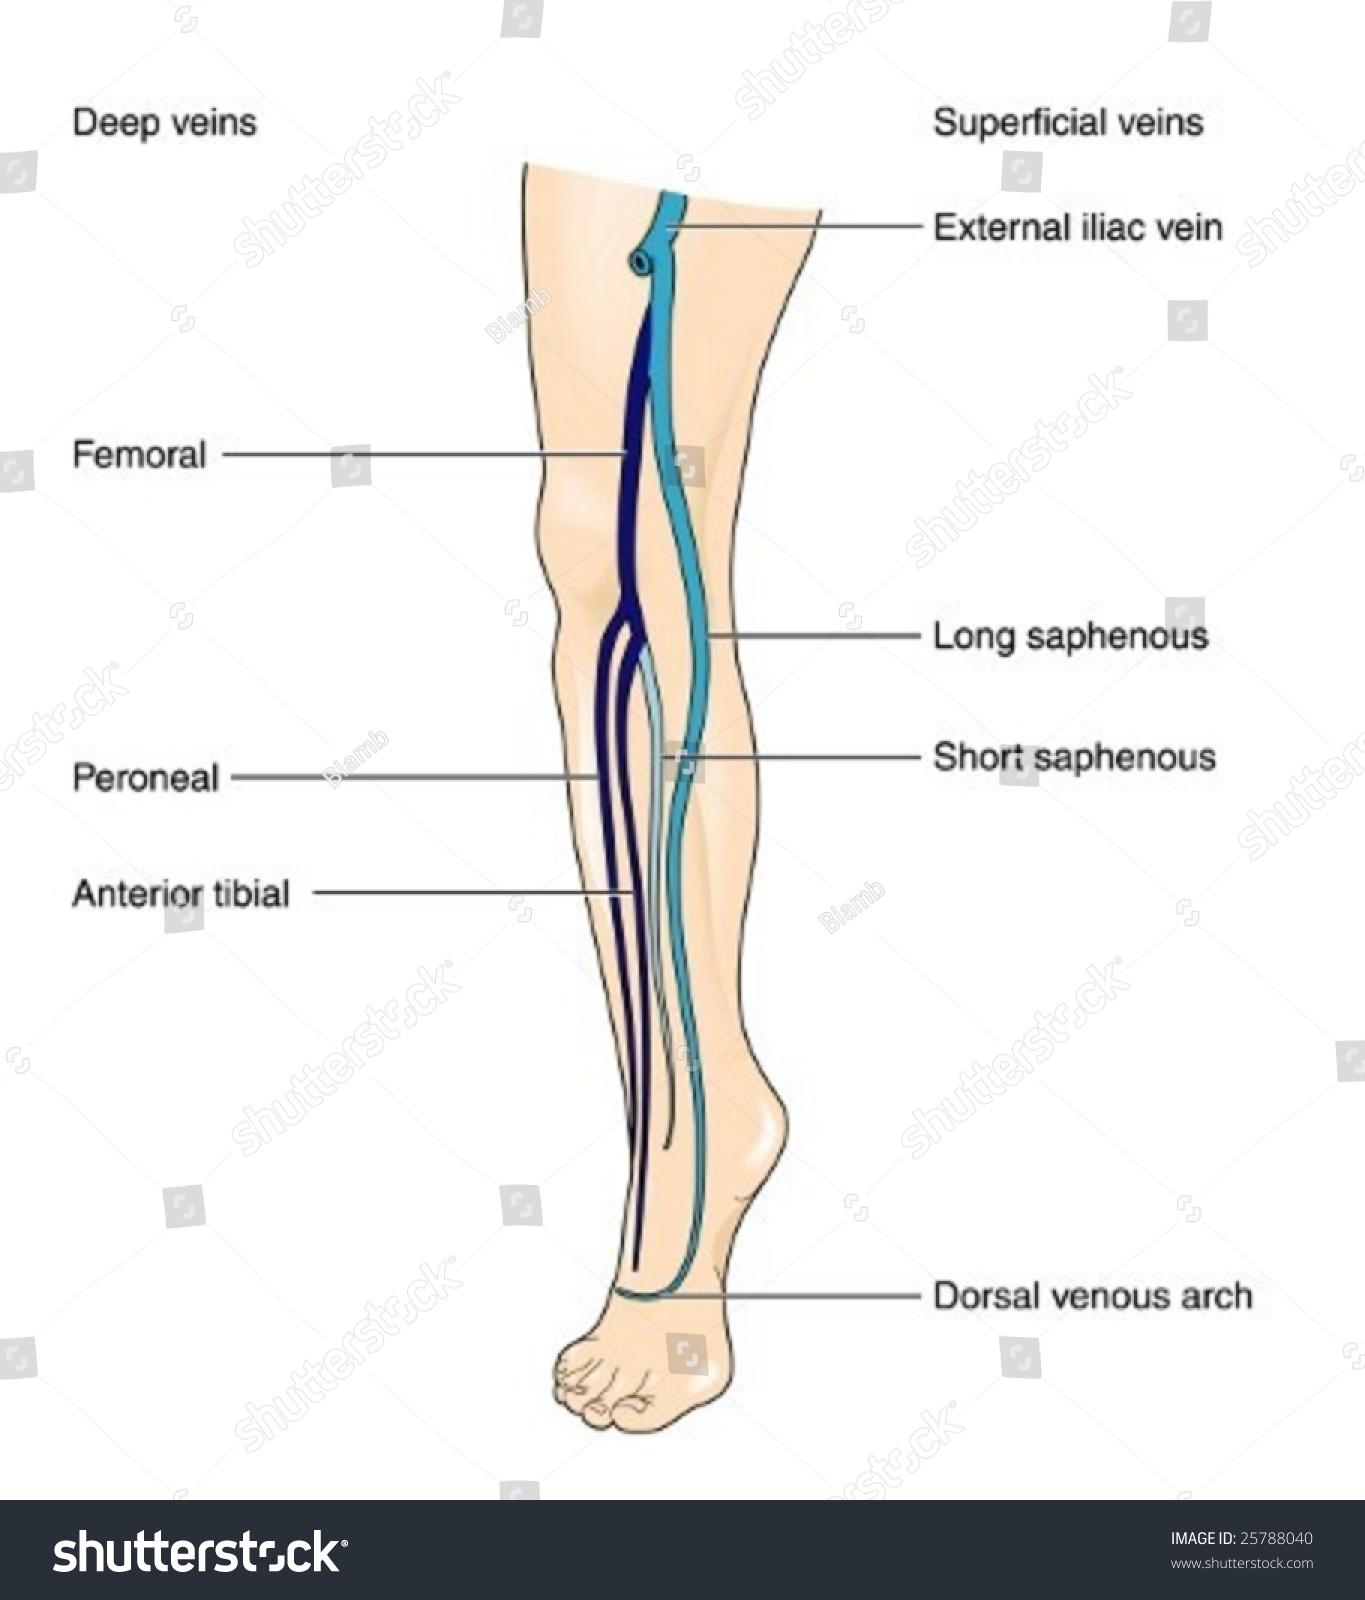 leg venous diagram 120 240 single phase motor wiring veins labeled stock vector 25788040 shutterstock